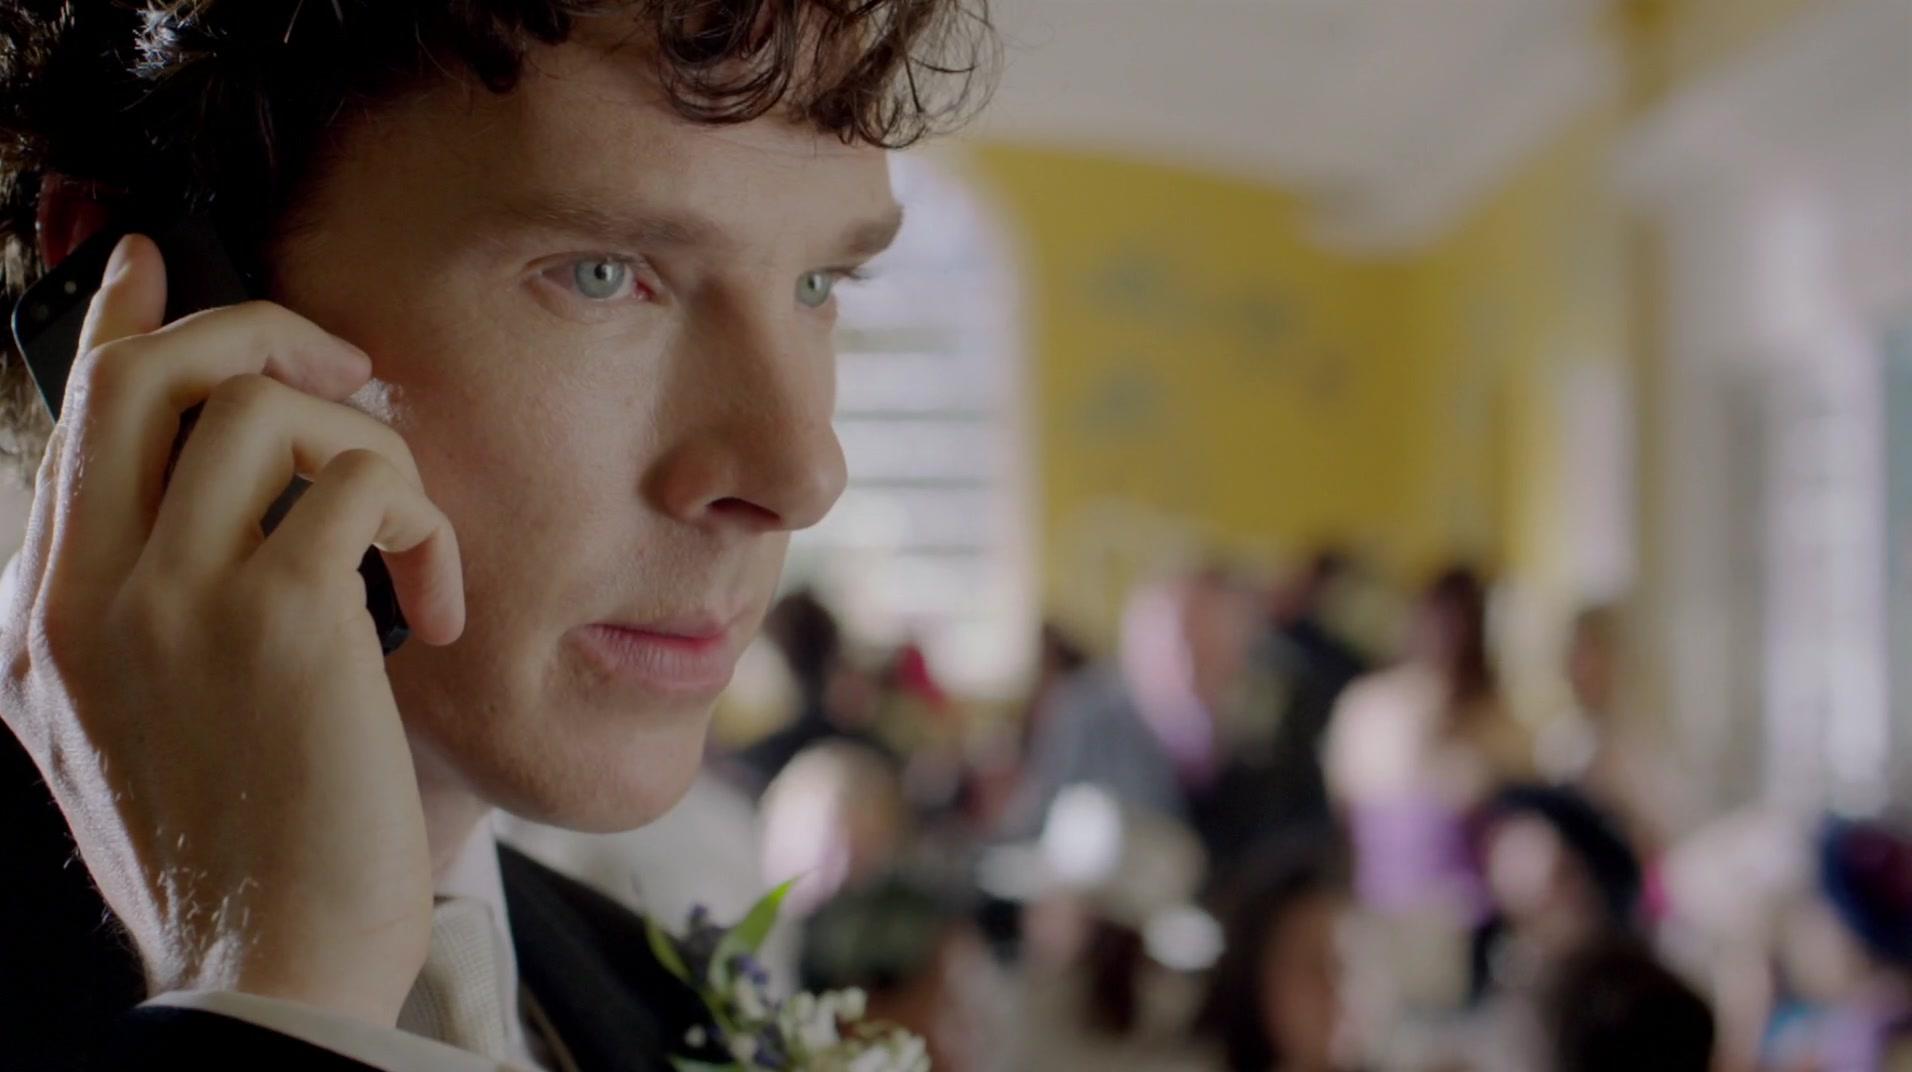 http://kissthemgoodbye.net/sherlock/albums/s3/e02/Sherlock_S03E02_1080p_kissthemgoodbye_net_0949.jpg